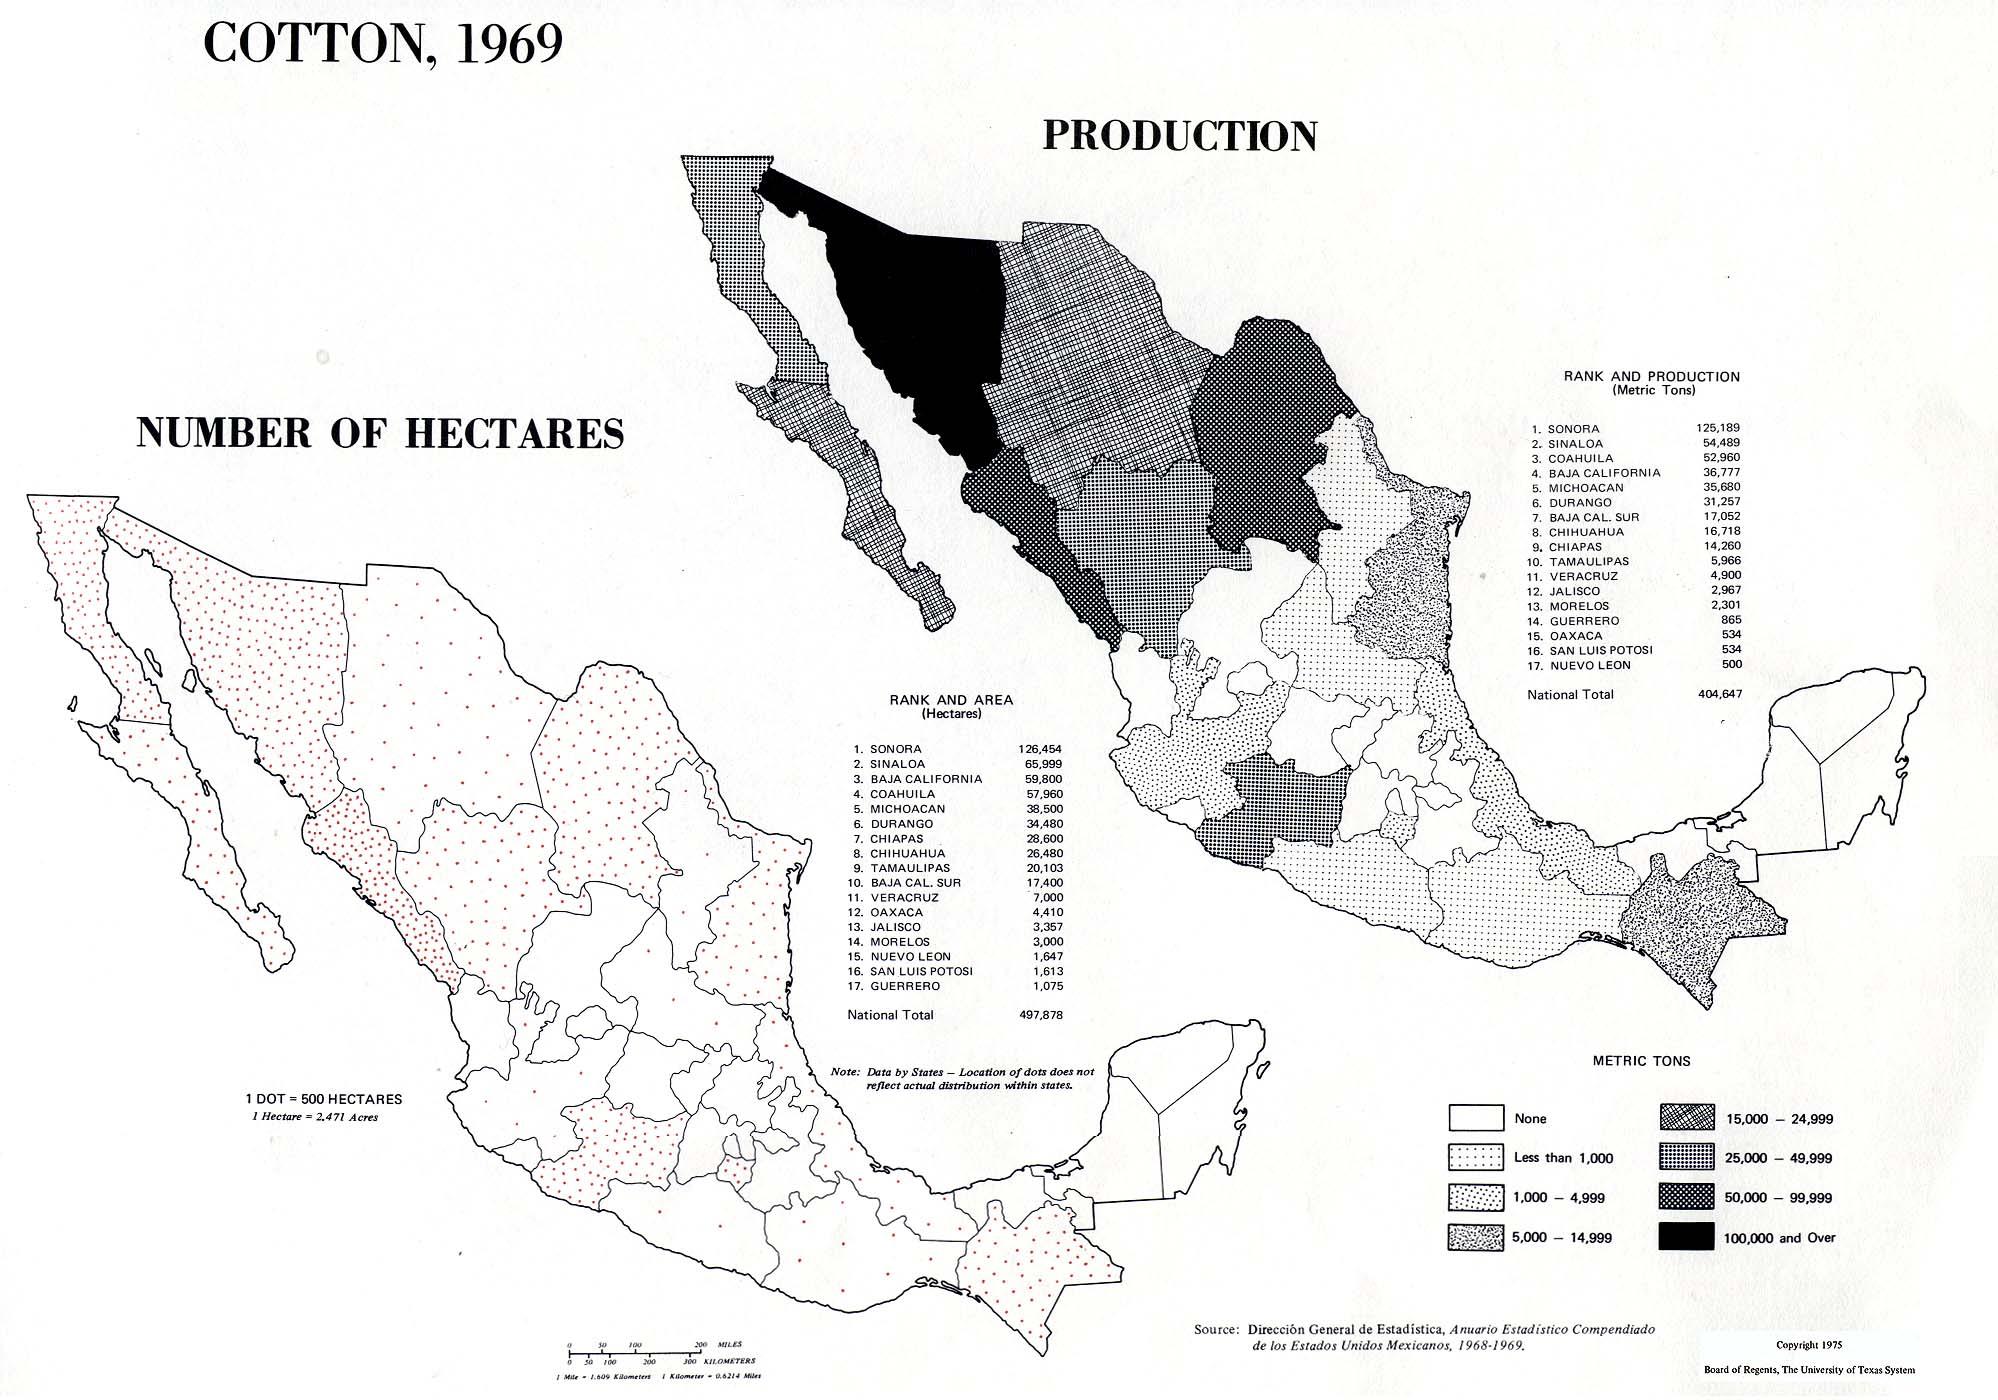 Mapa de Producción de Algodón en México 1969